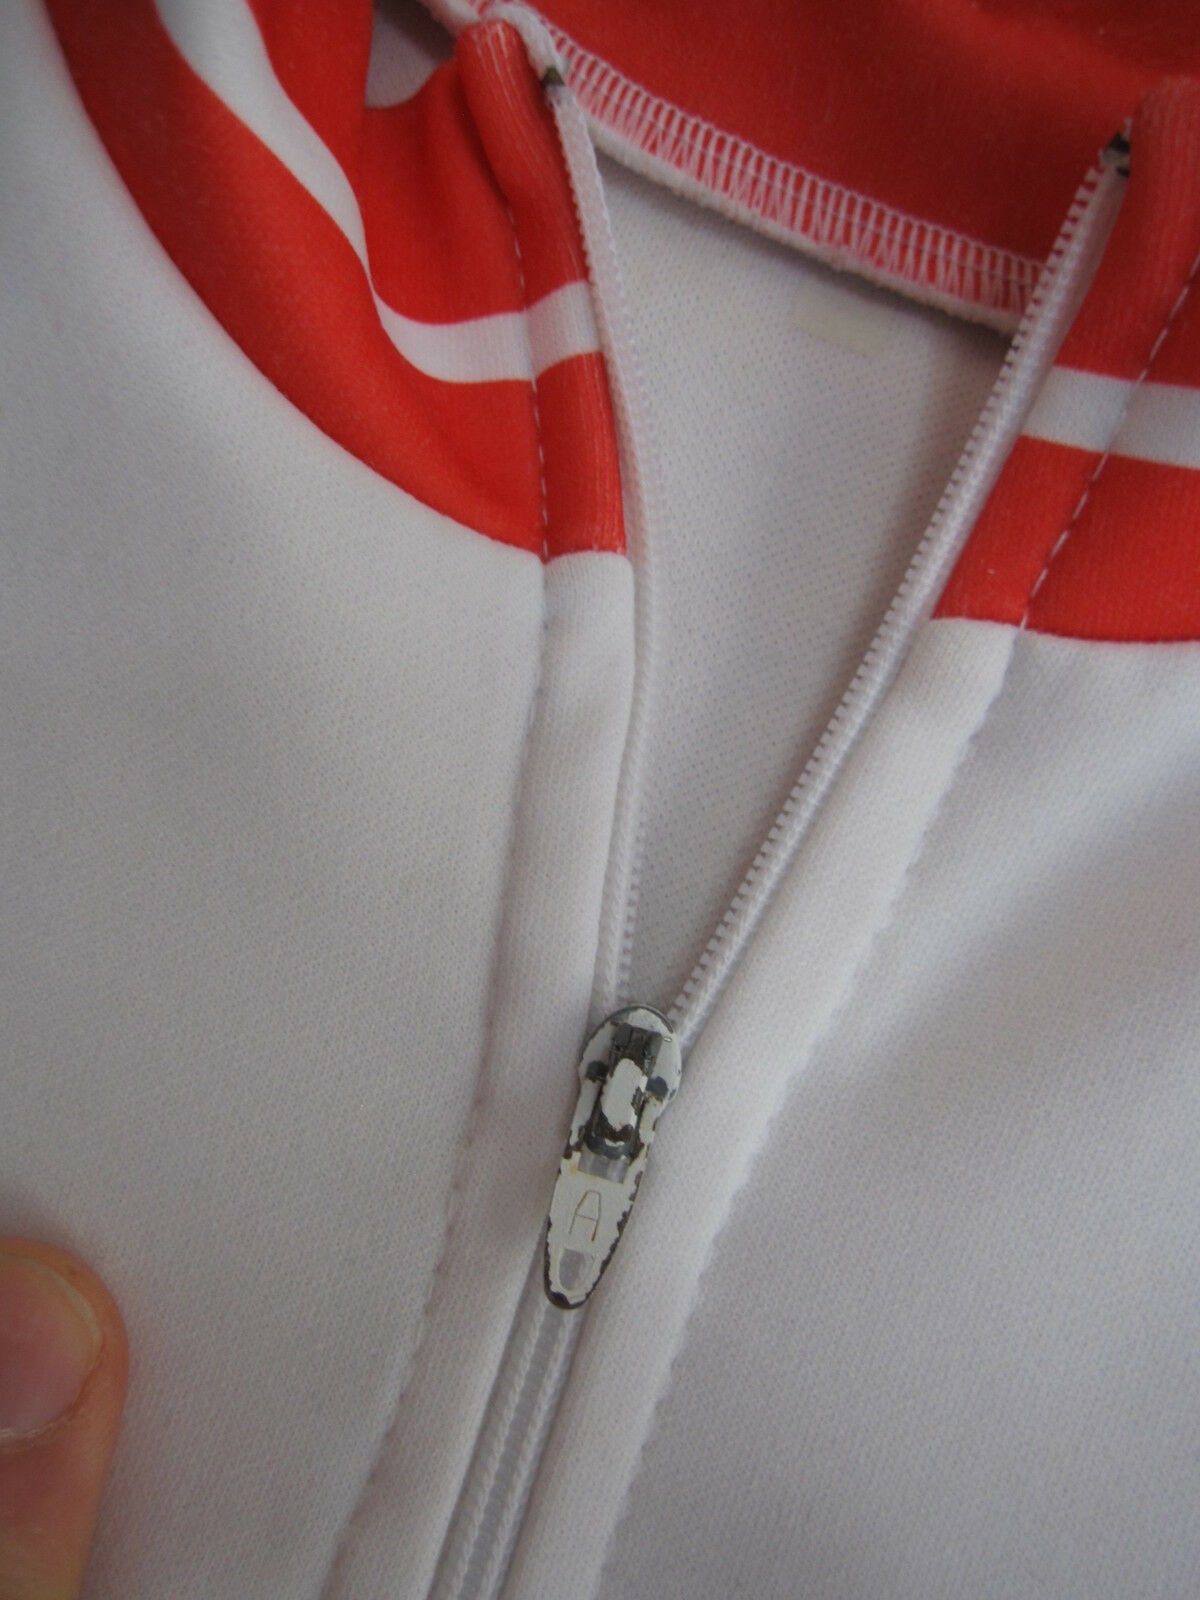 Maillot cycliste VSS Postic SA lubrifiants lubrifiants lubrifiants shell Gaudart Scaer shirt - 4   L 138ad9